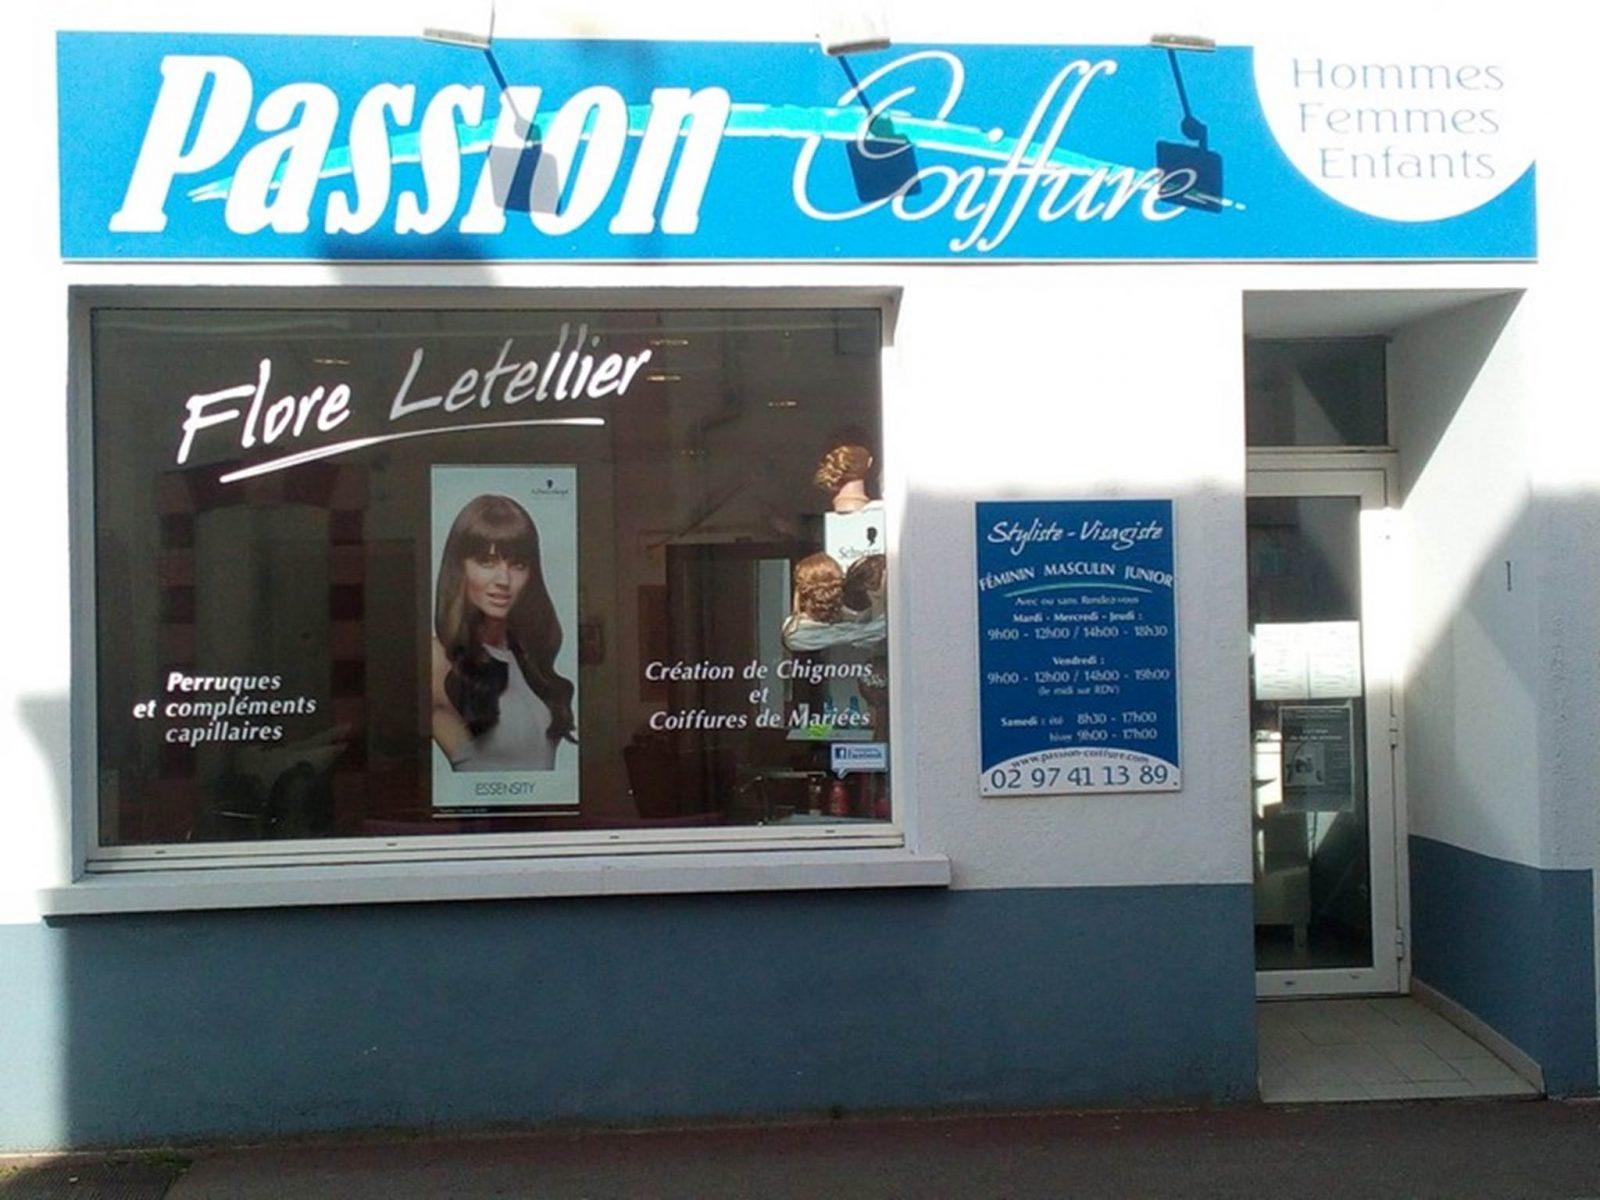 Passion Coiffure Ambon Morbihan